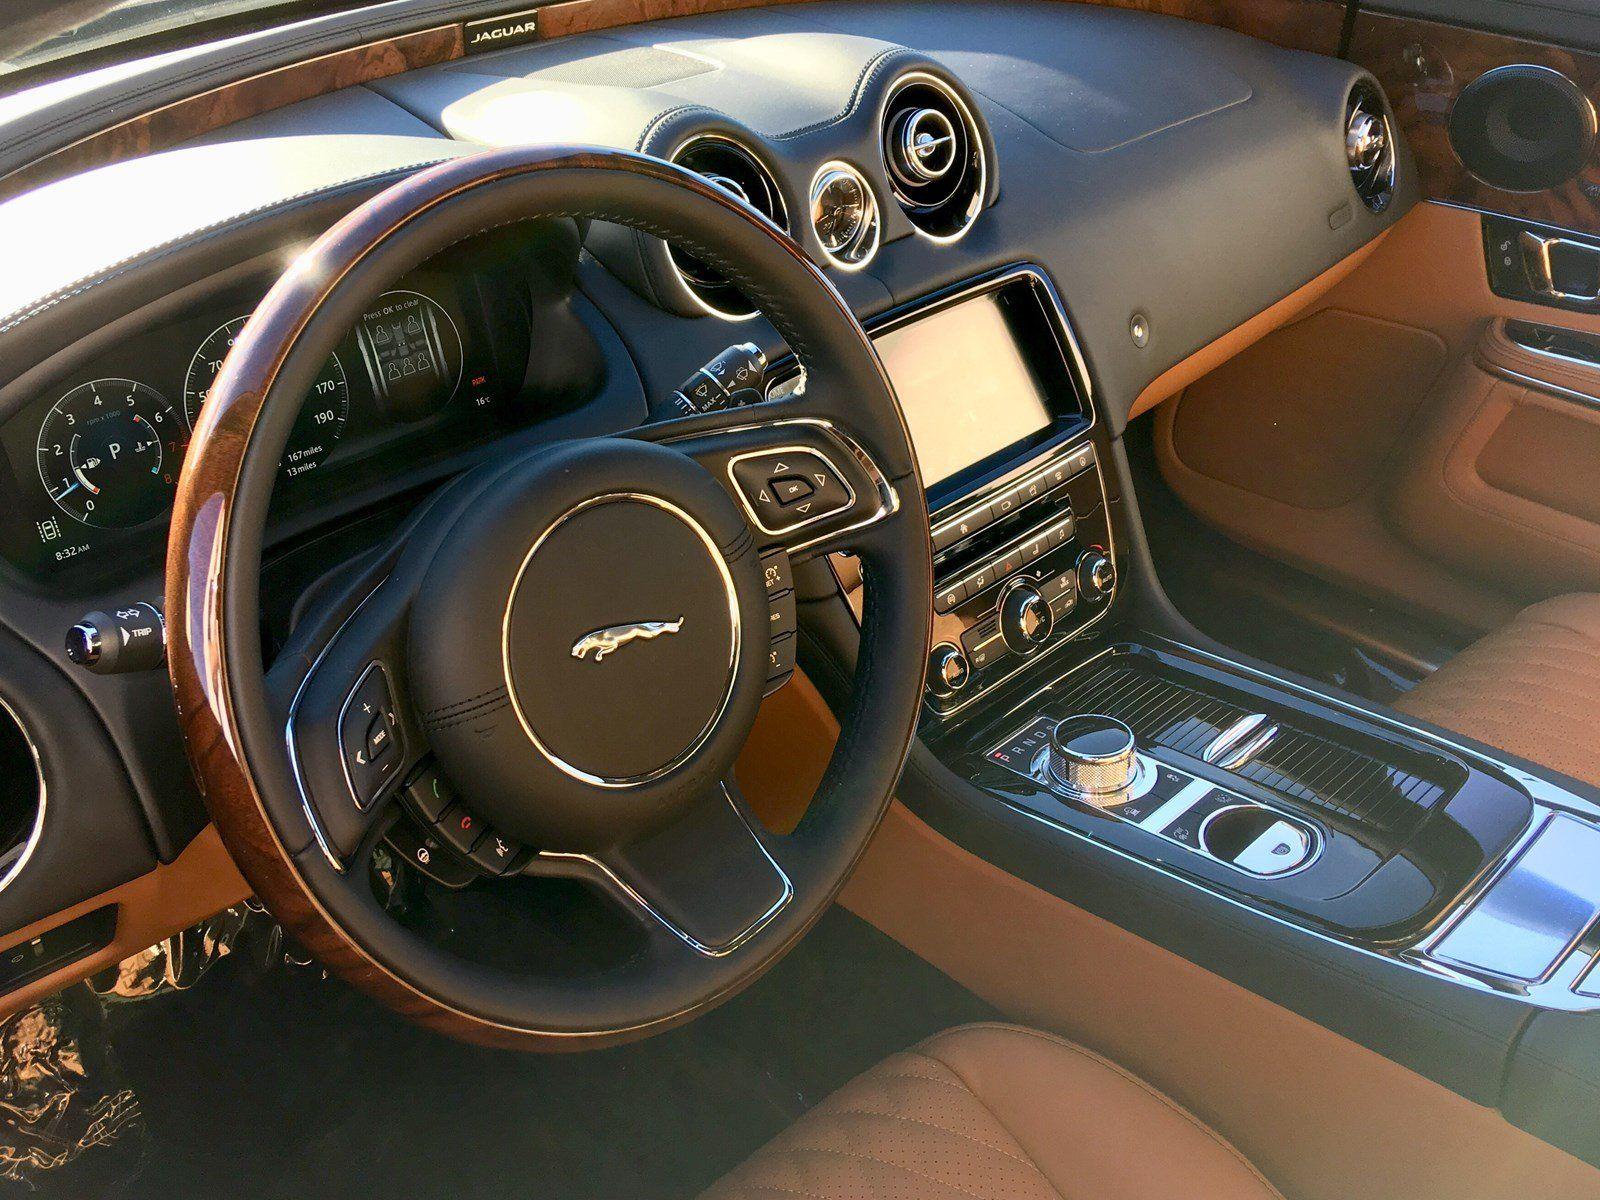 New 2018 Jaguar Xj L Portfolio For Sale In Ventura Ca 93003 Sedan Details 474476332 Autotrader Jaguar Xj Jaguar Car Jaguar